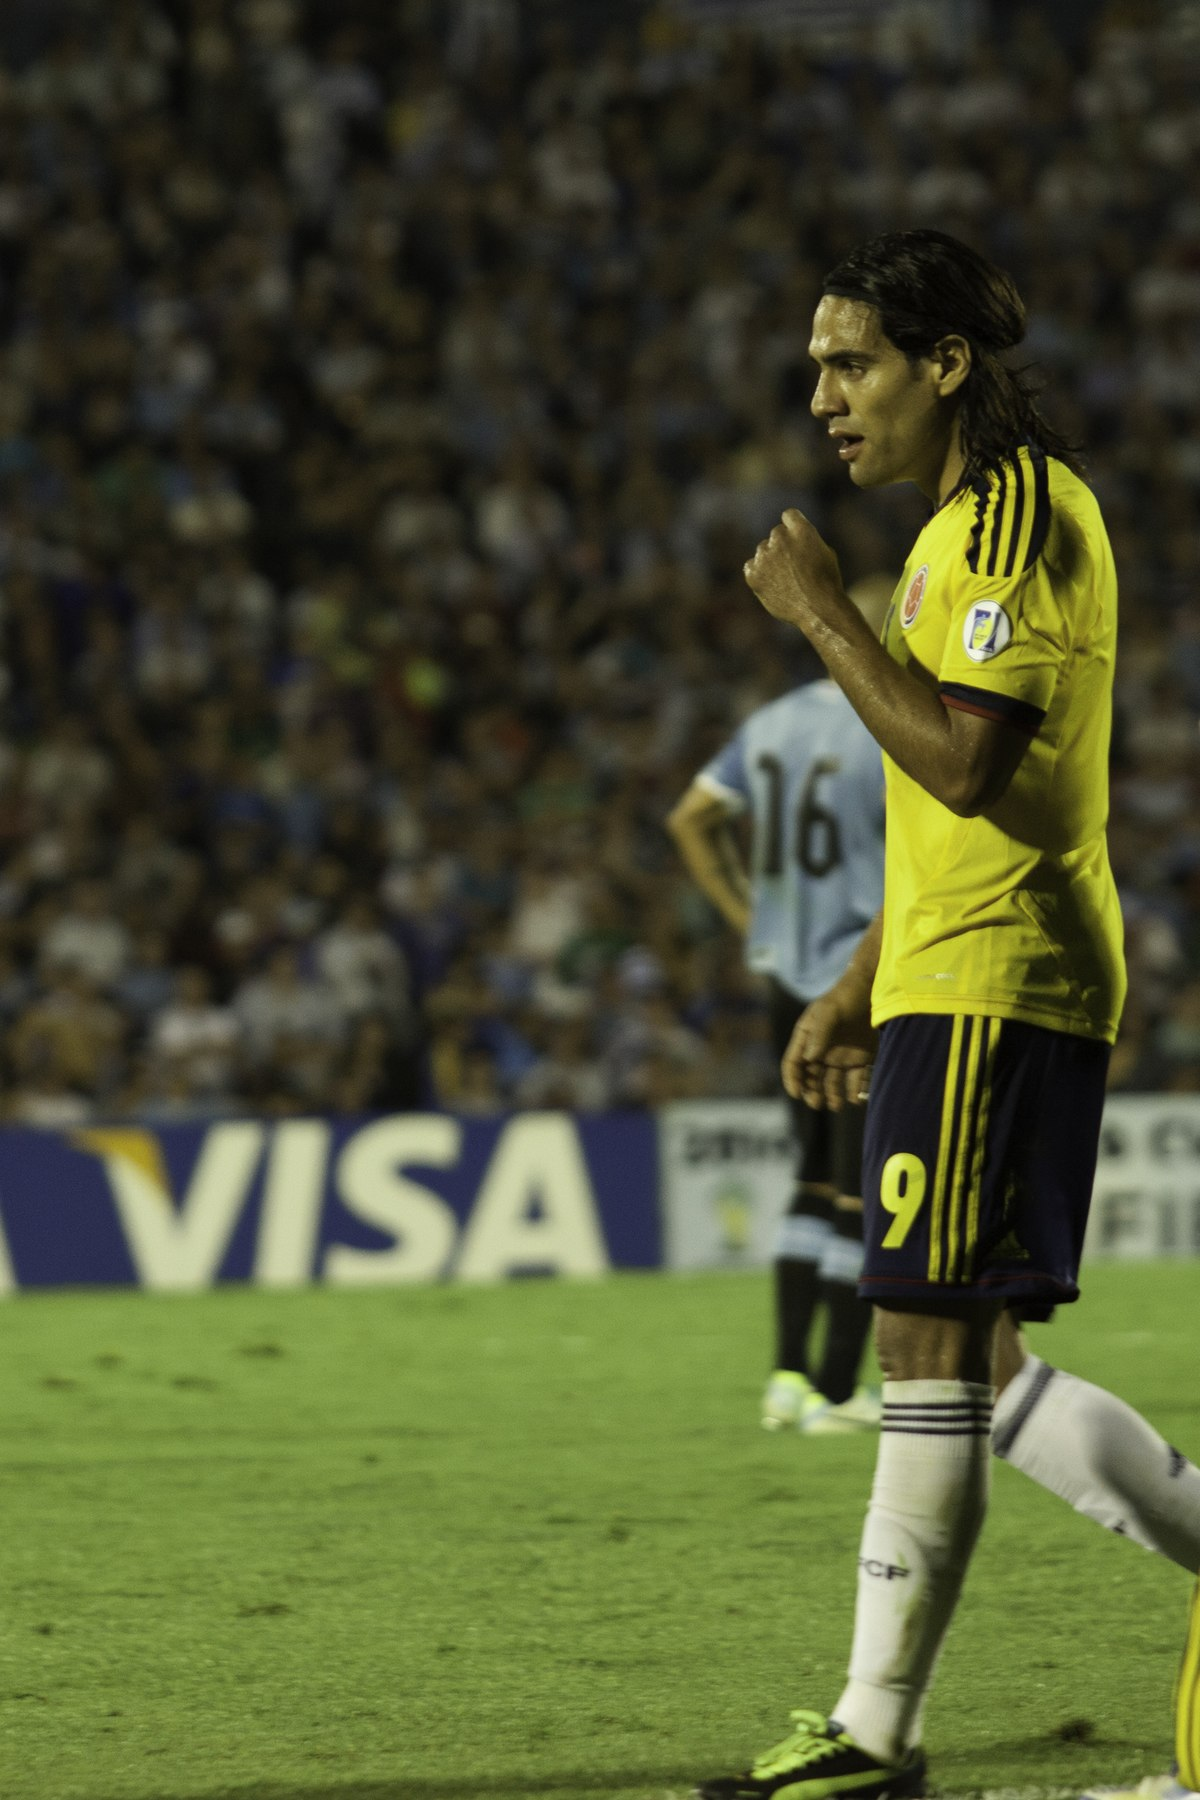 List of international goals scored by Radamel Falcao